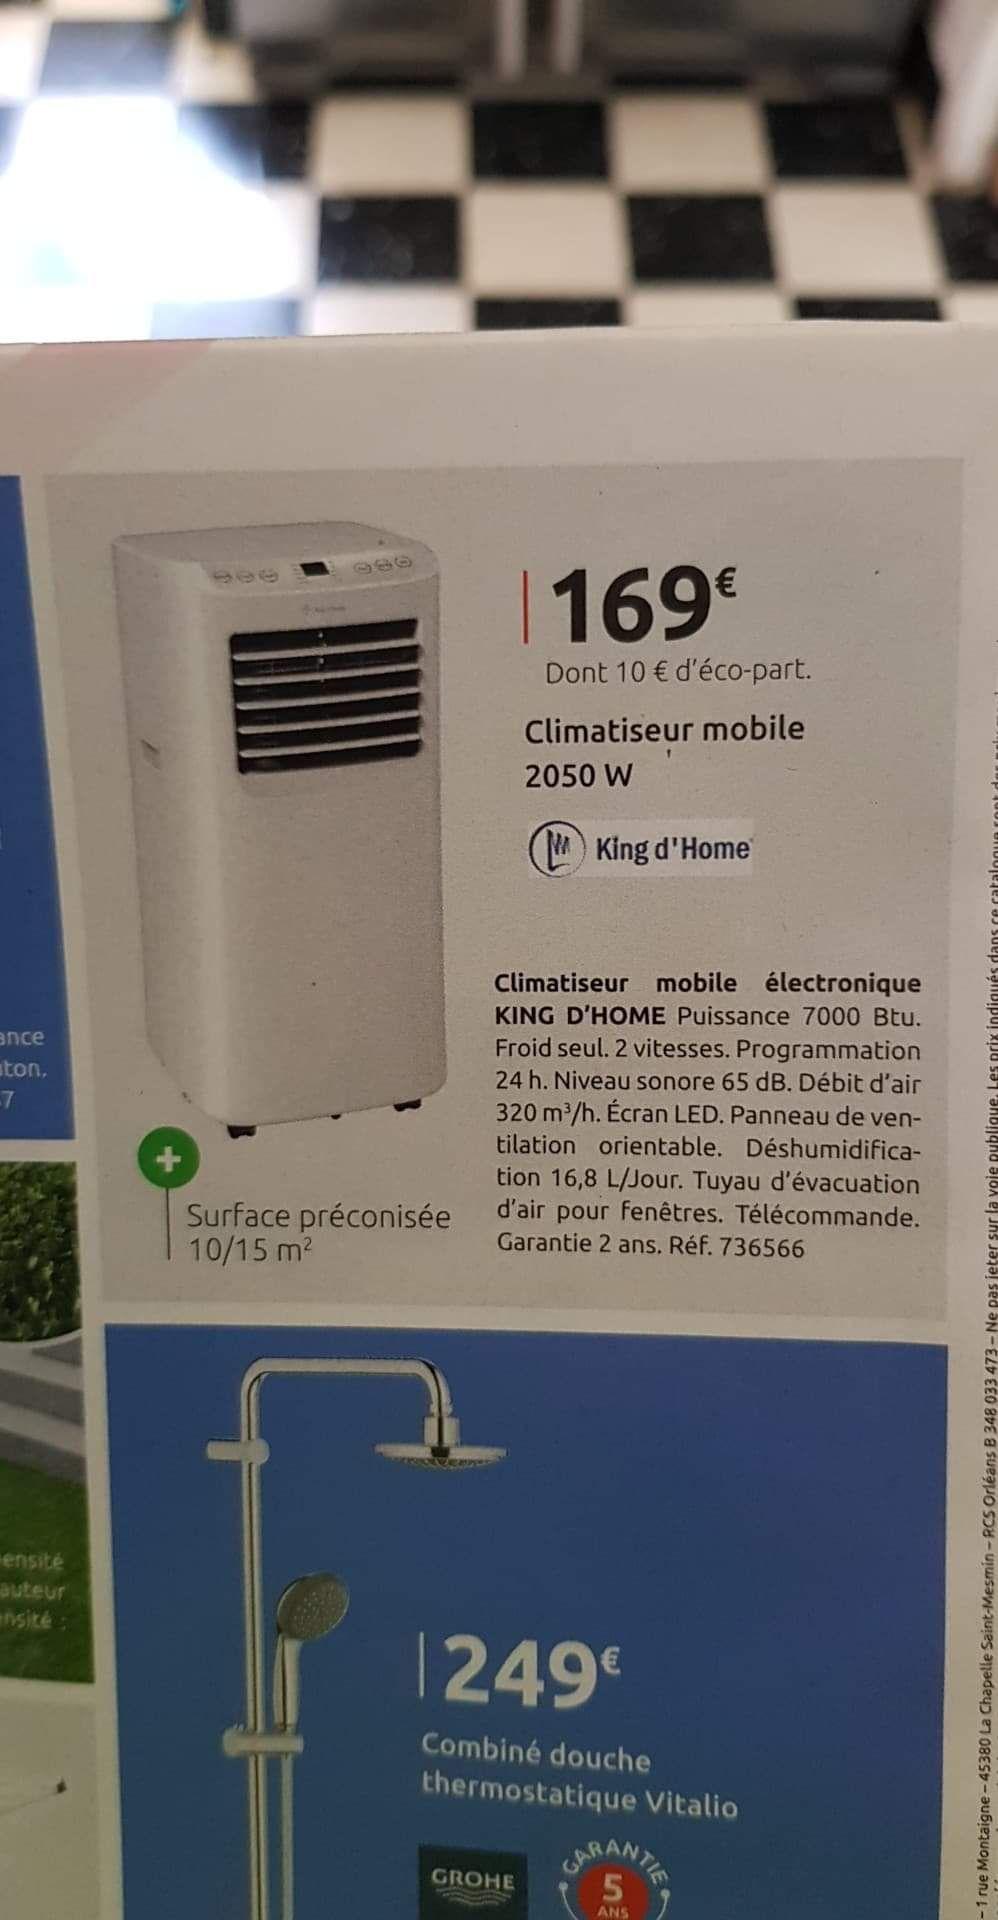 Climatiseur Mobile King D Home 7000 Btu 2050 W Dealabs Com